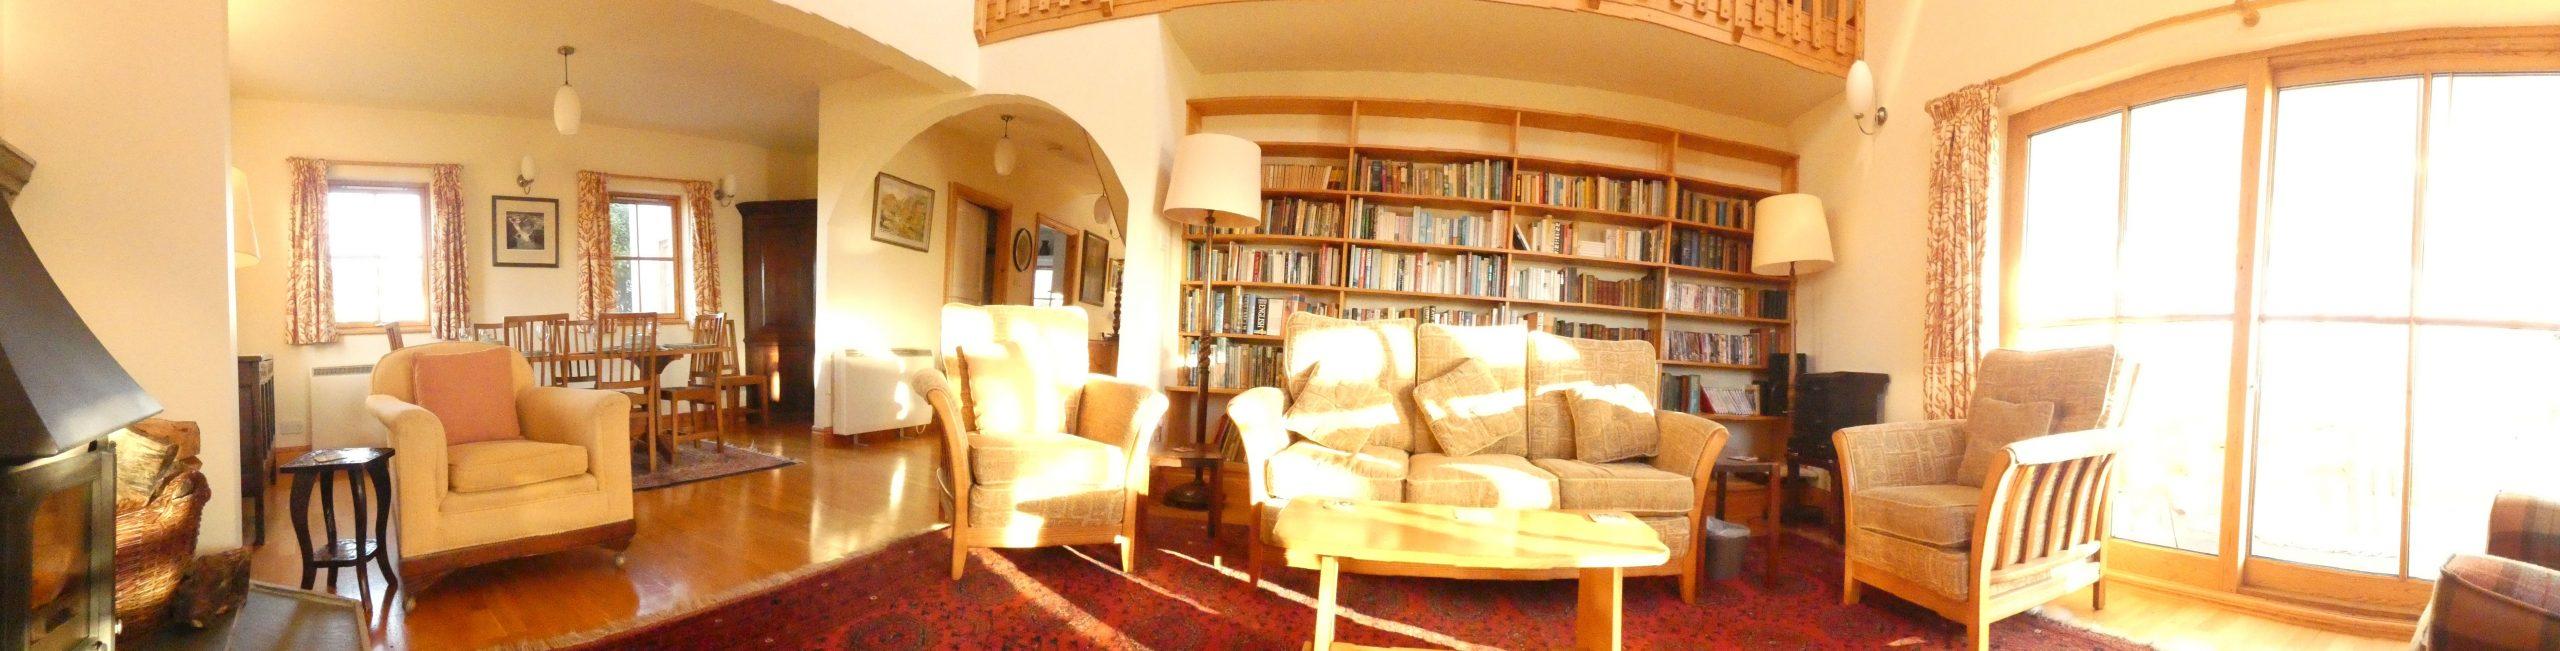 sitting room panorama P1010610